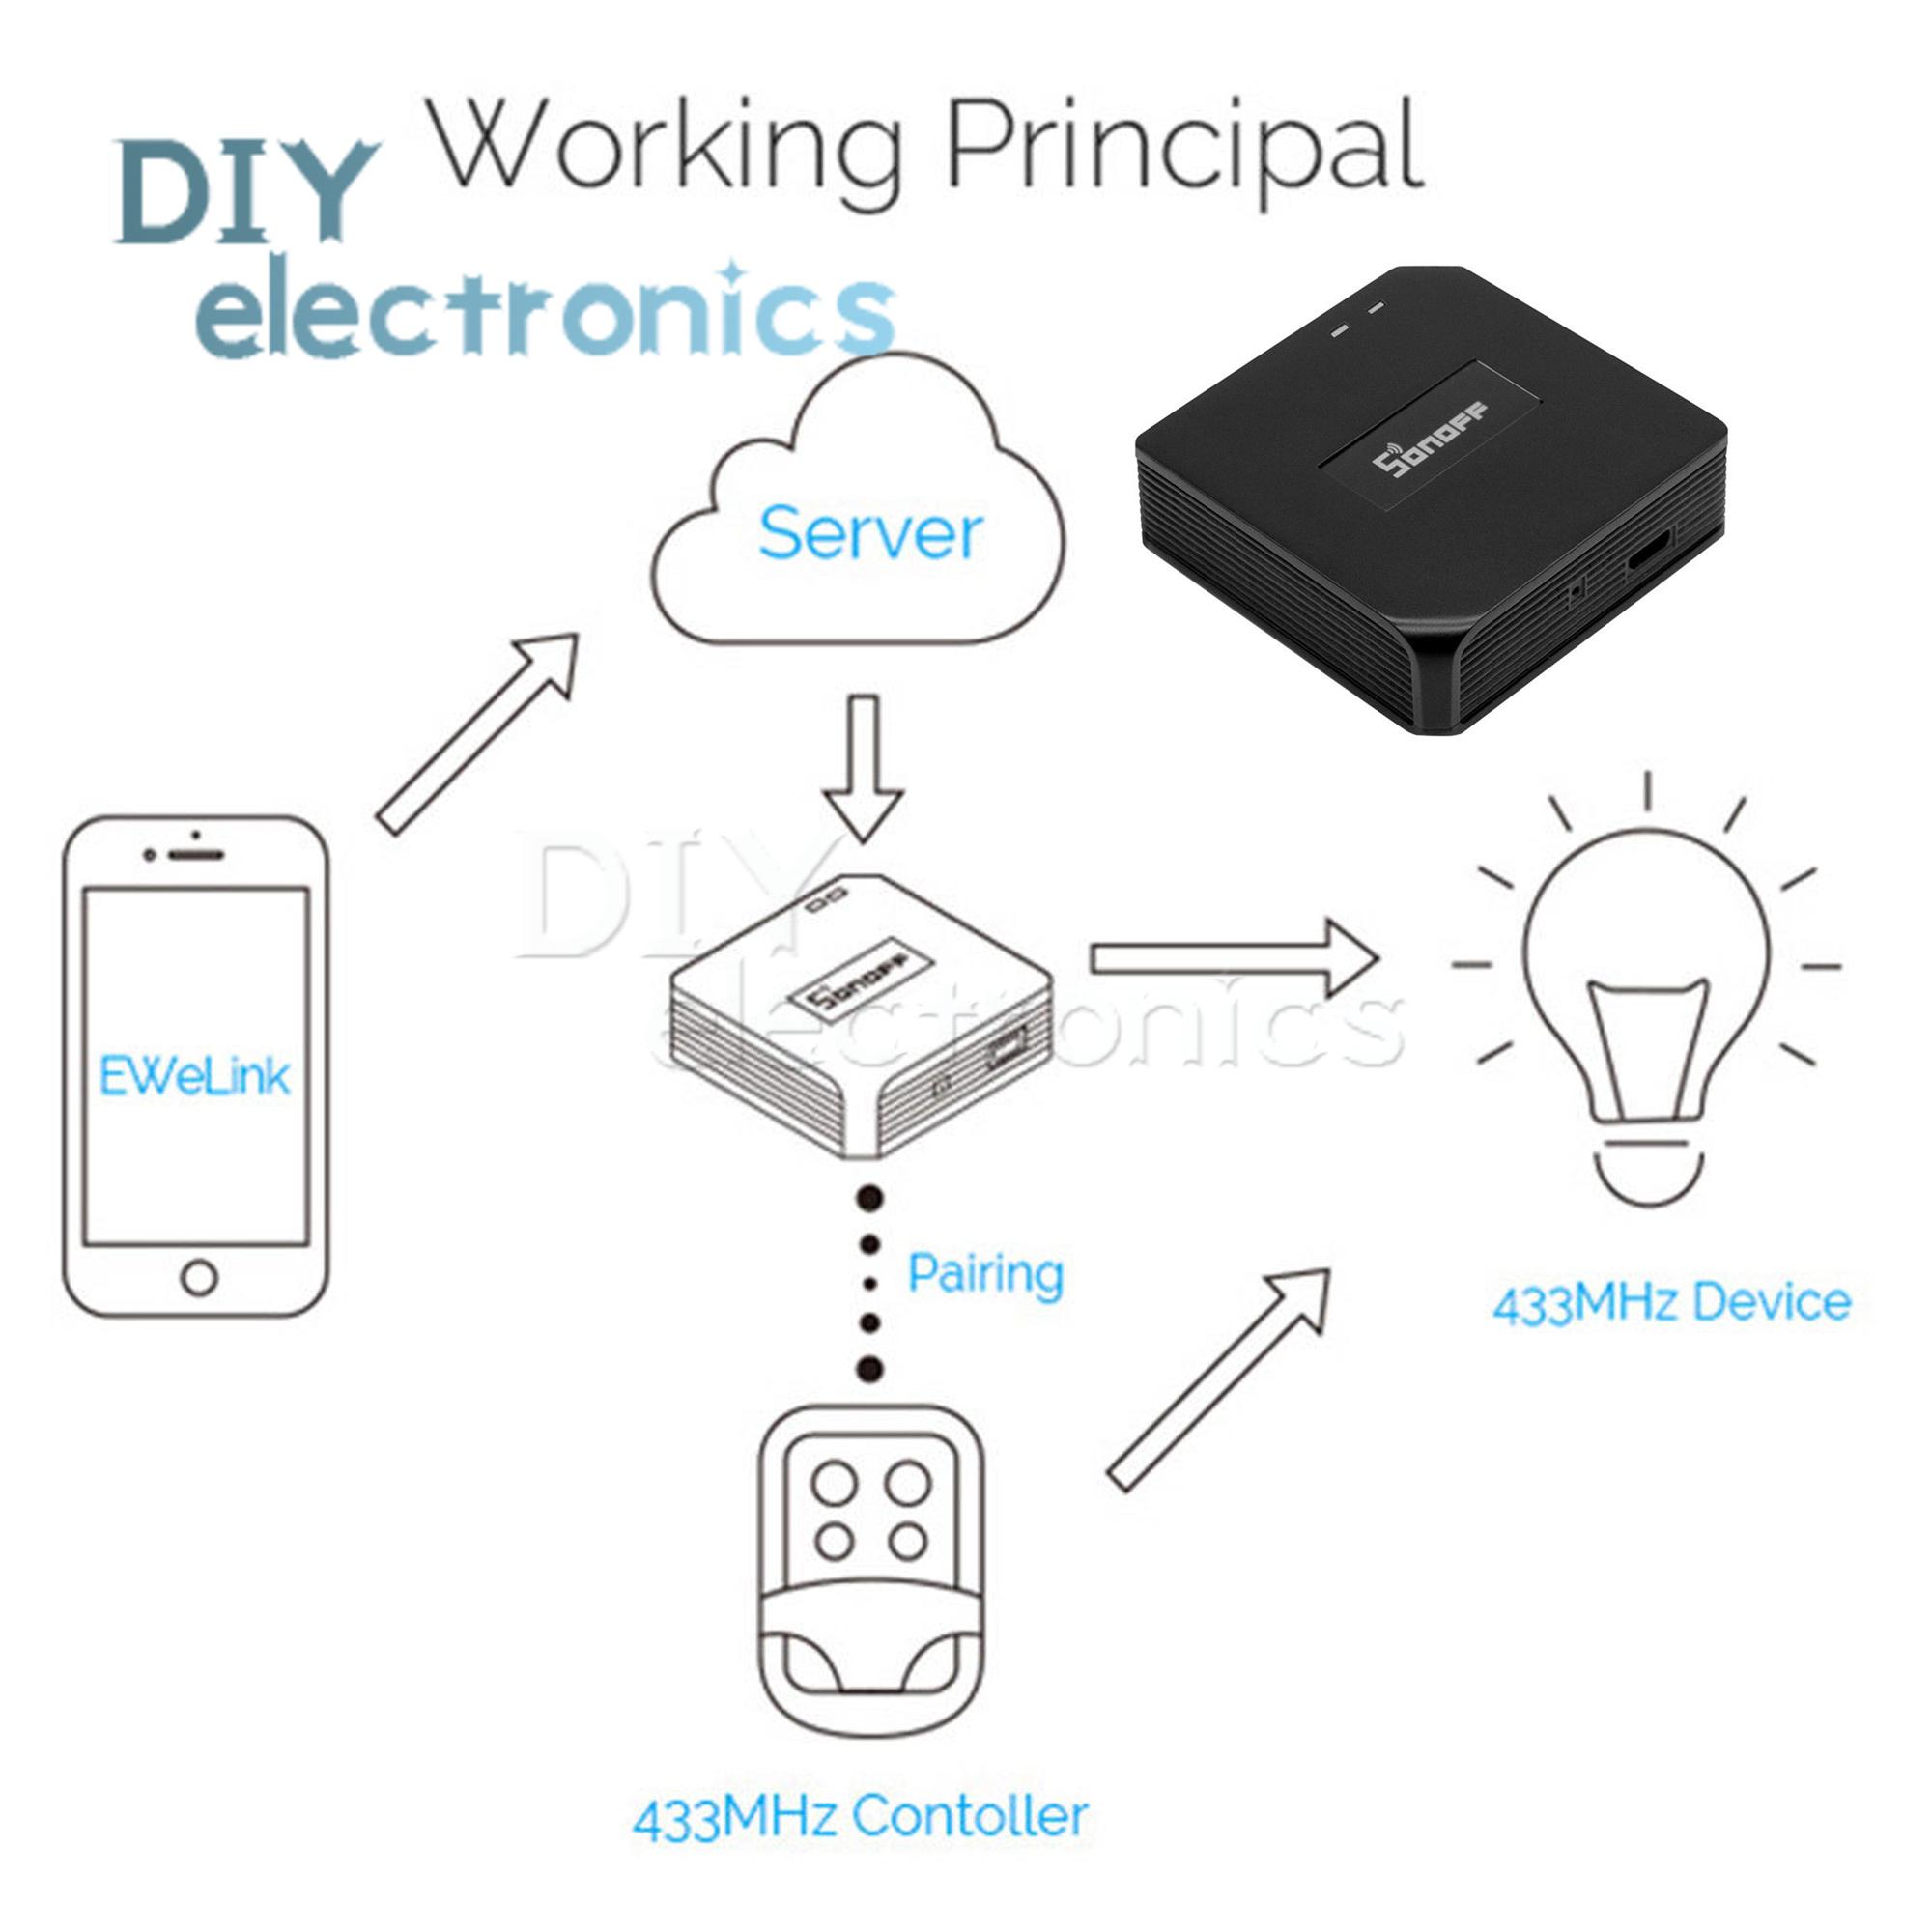 Sonoff Rf Bridge 433mhz Switch Wifi Fernbedienung Smart Home Diy Electronicsdiycomcircuit And The Thief Item Description